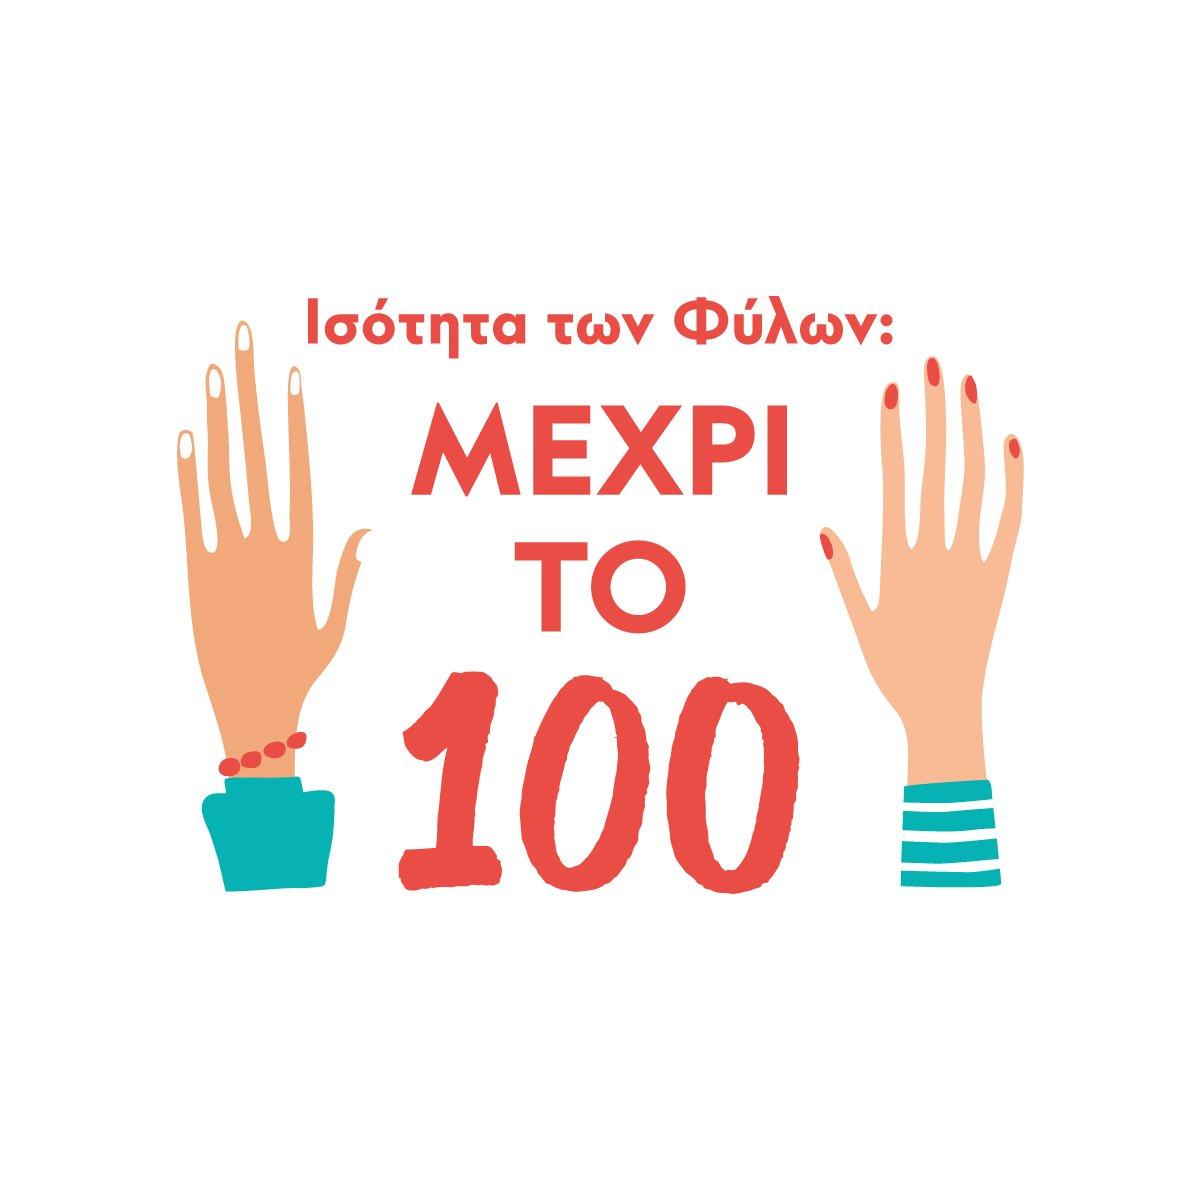 mexri-100-logo-square (1)